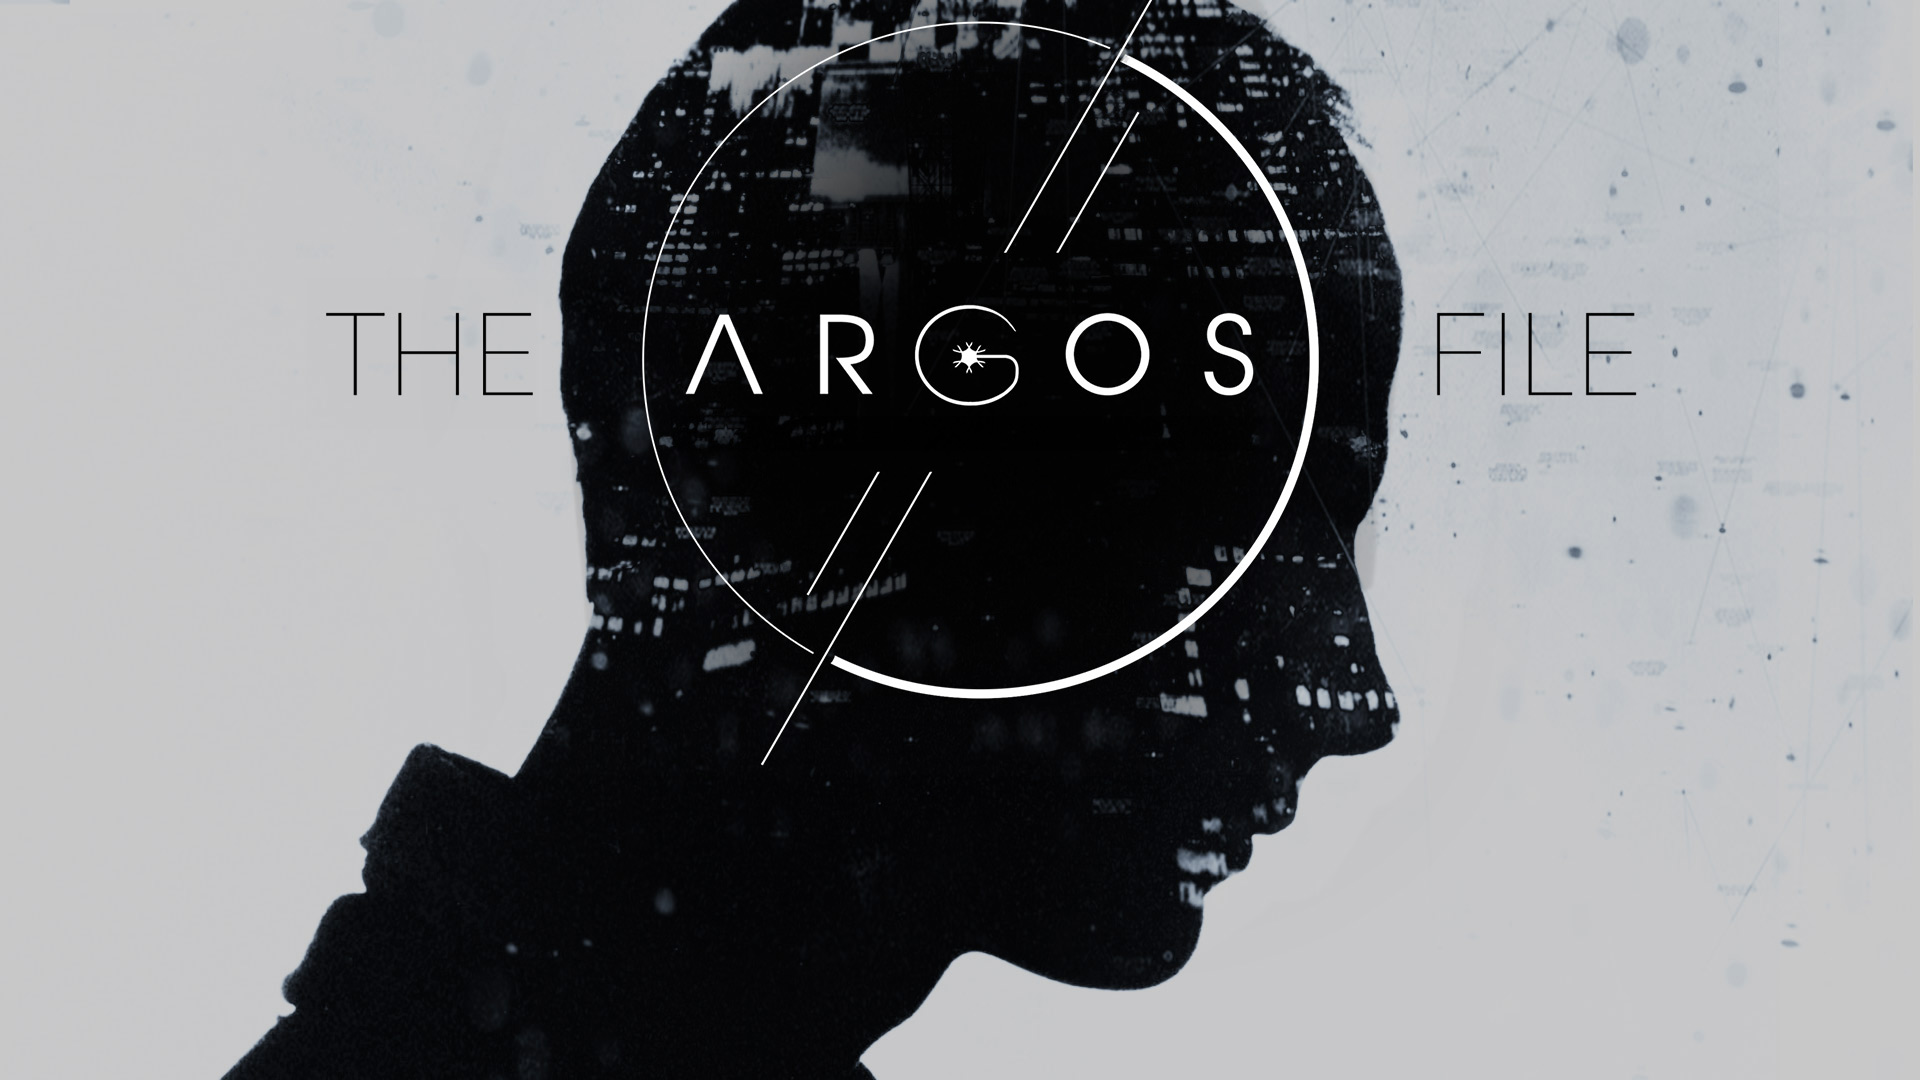 the argos file image